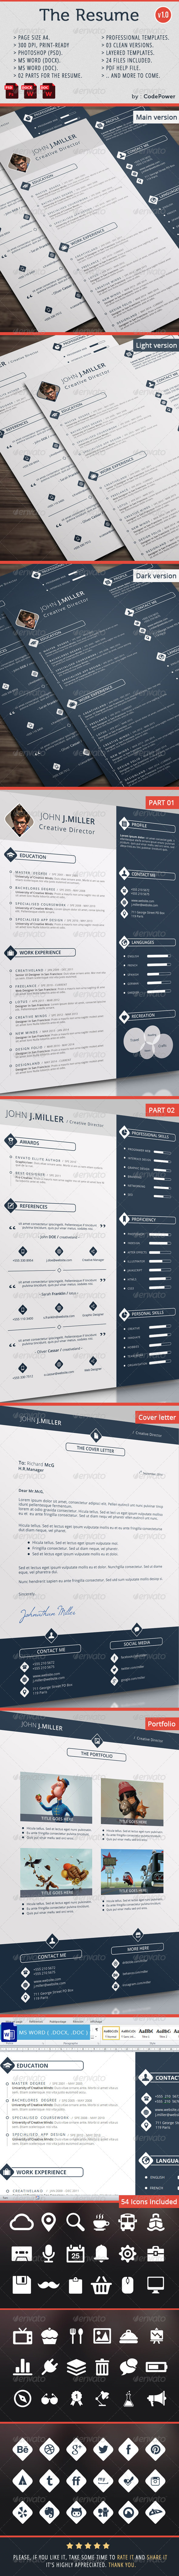 GraphicRiver The Resume 8541648